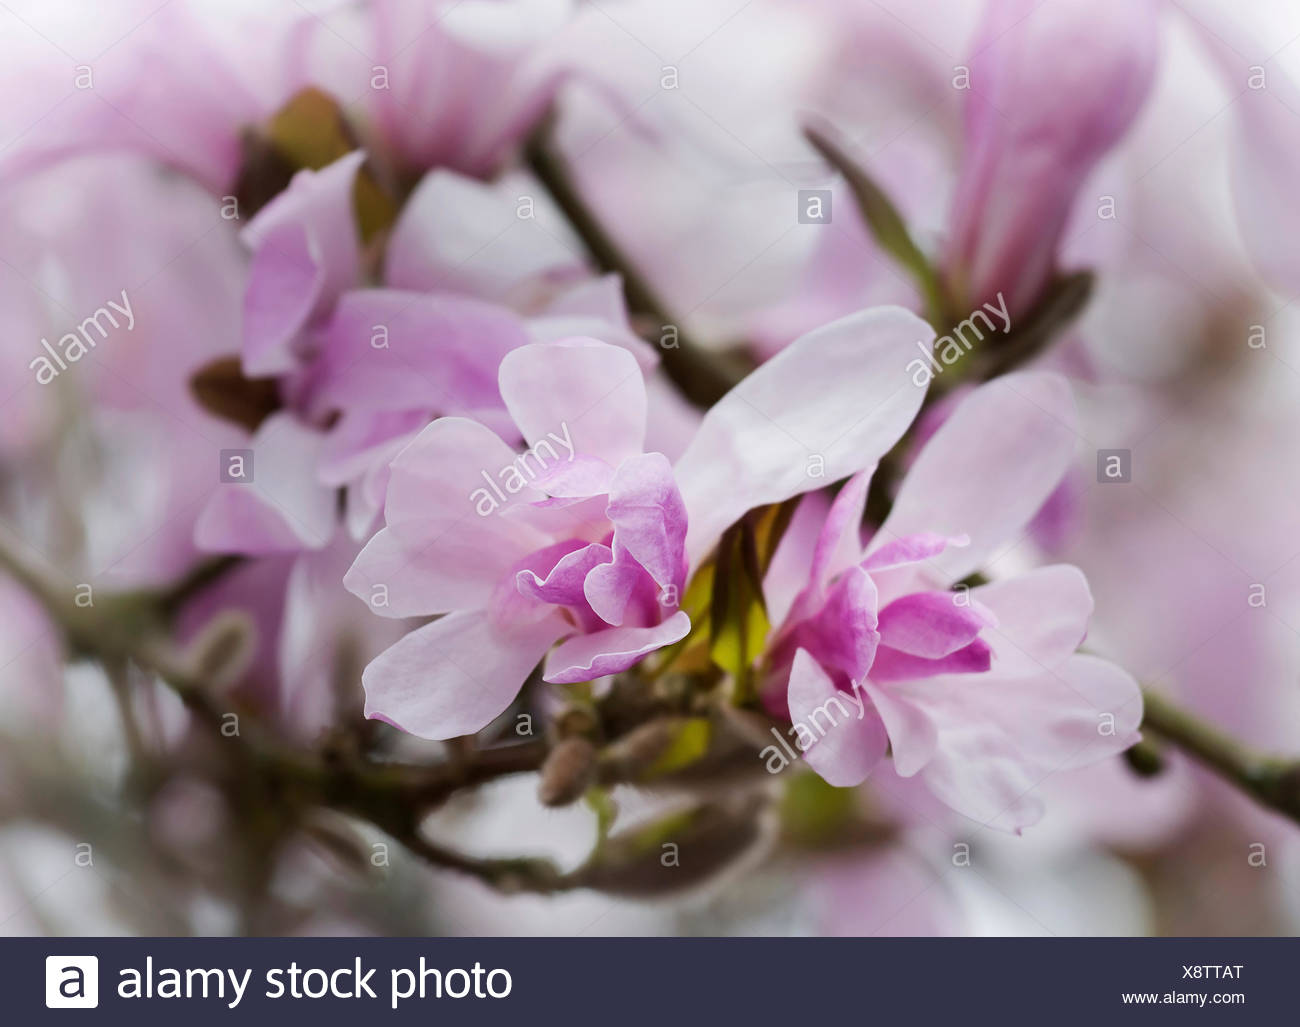 Magnolia, Magnolia 'Leonard Messel', Magnolia x loebneri 'Leonard Messel', Pastel pink flowers growing outdoor on the tree. Stock Photo